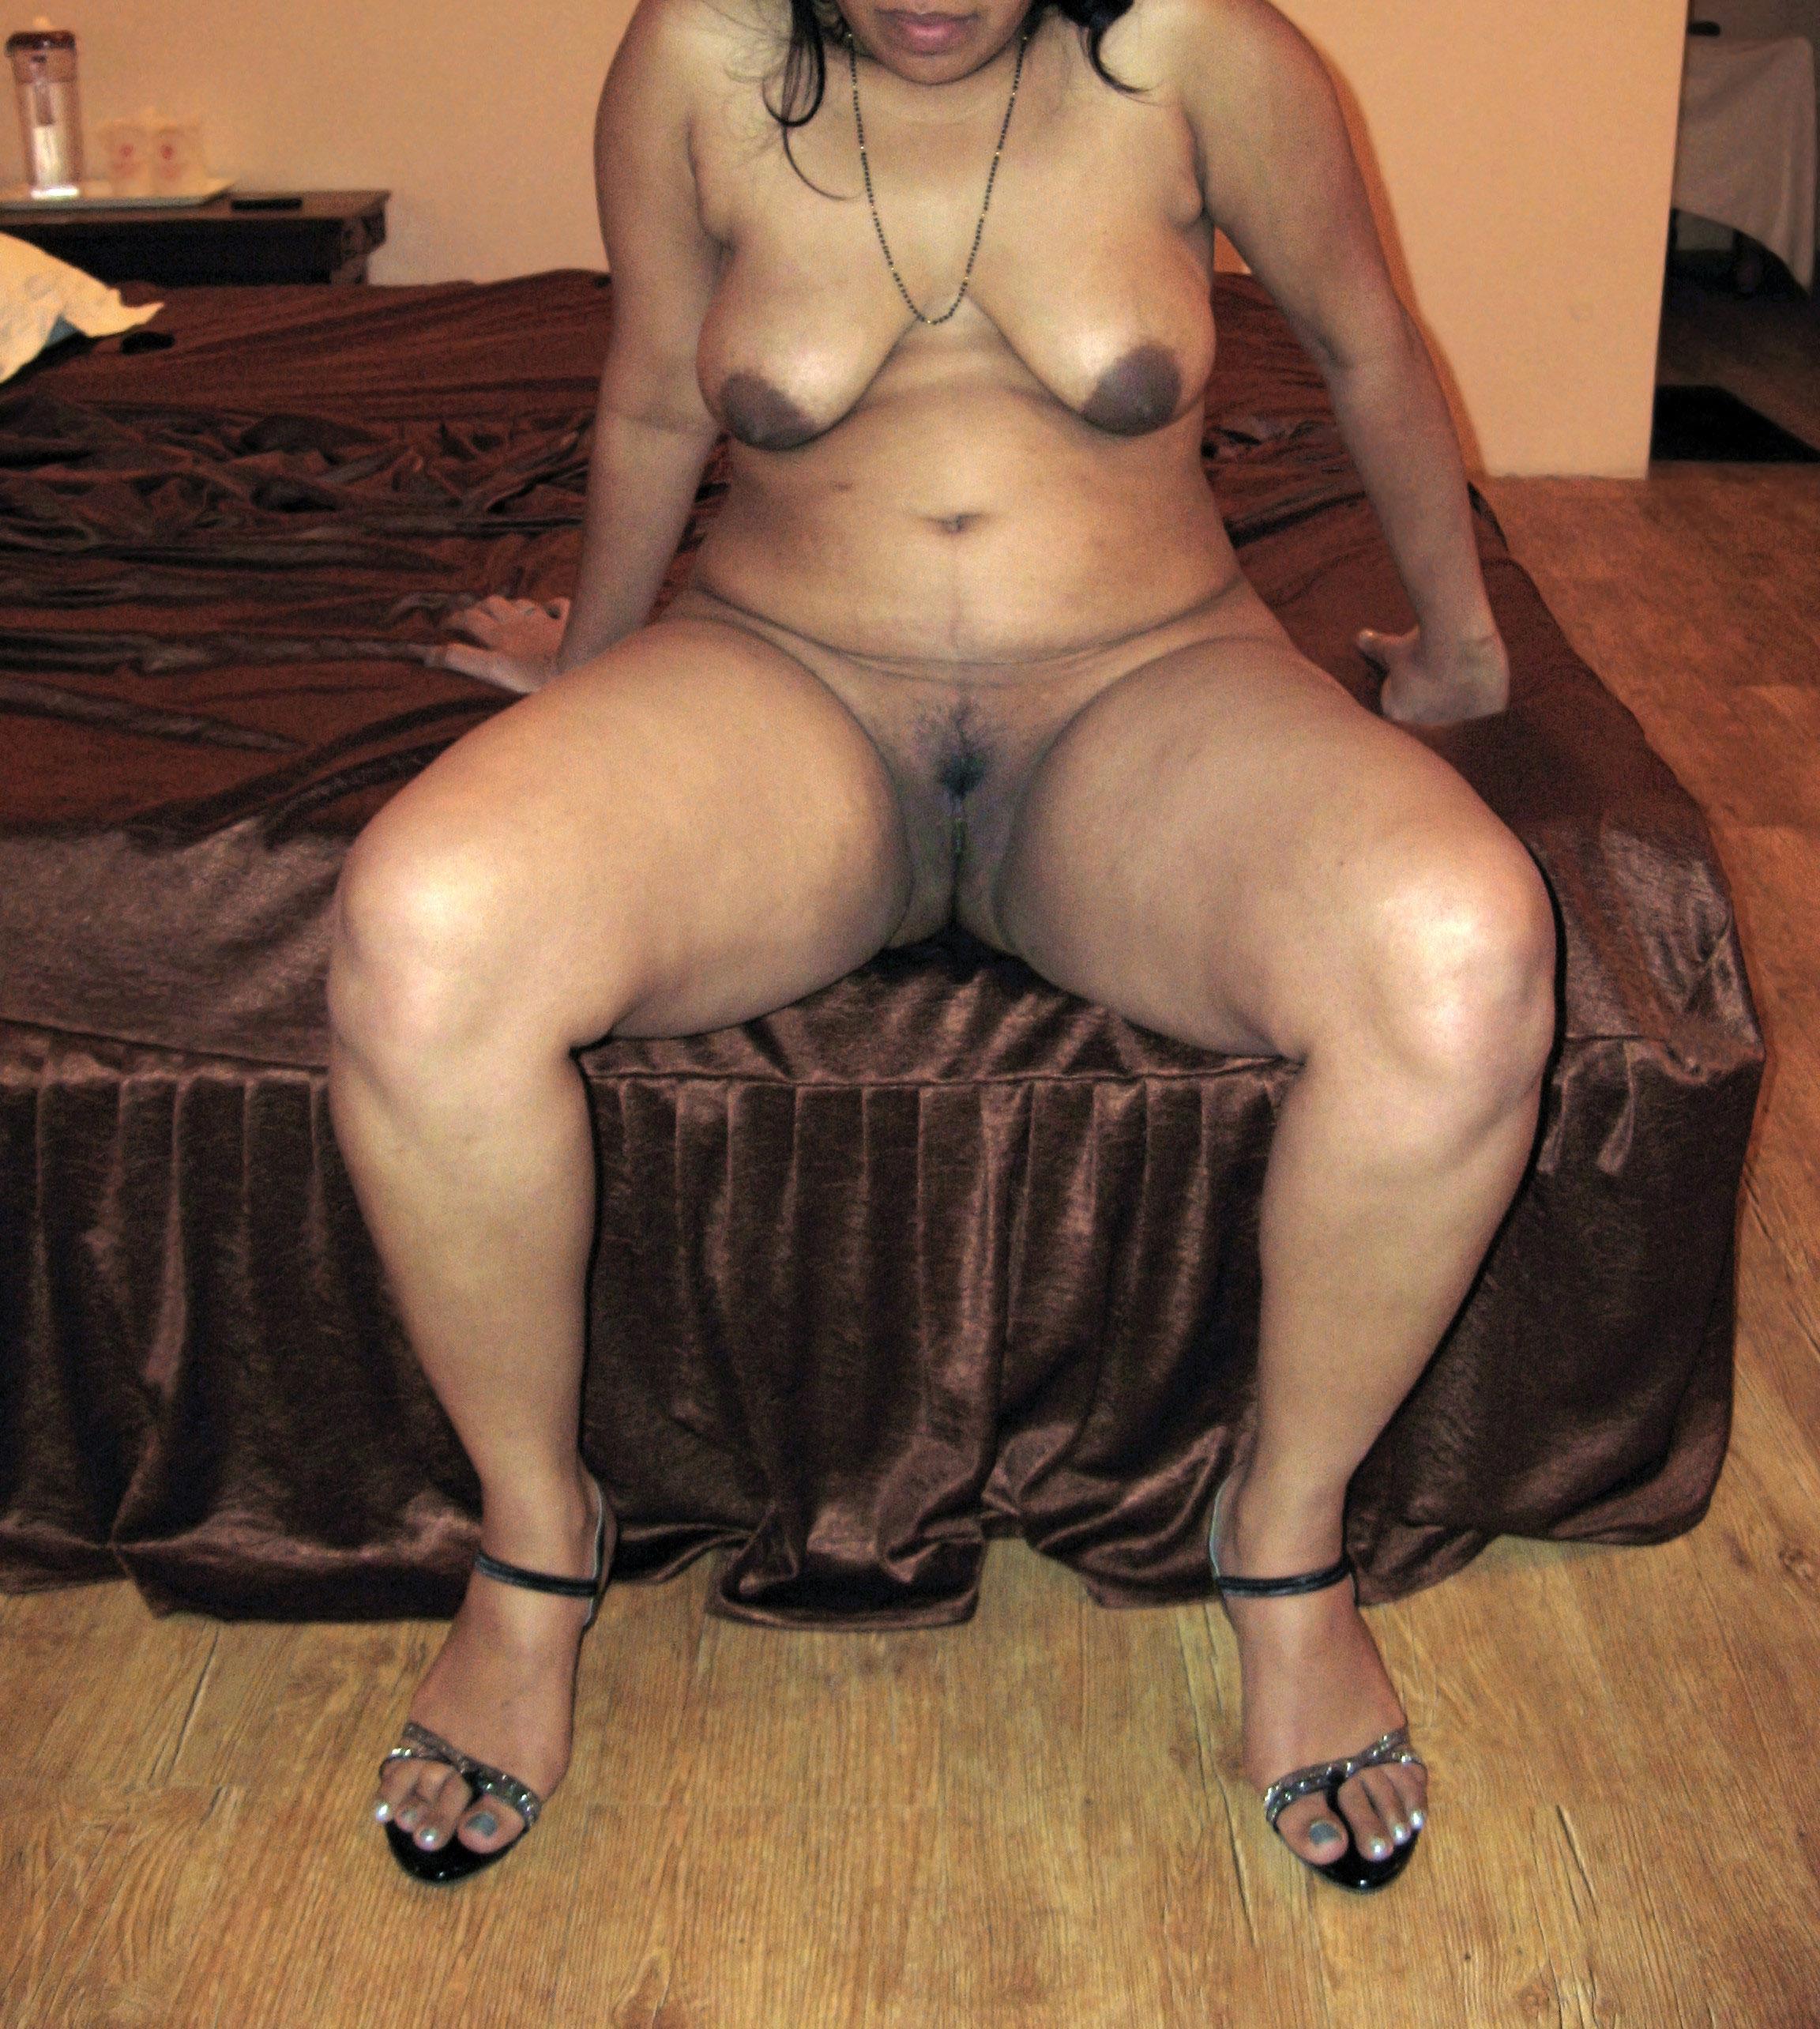 Naughty Full Nude Indian Ladies Erotic Bedroom Pics ...